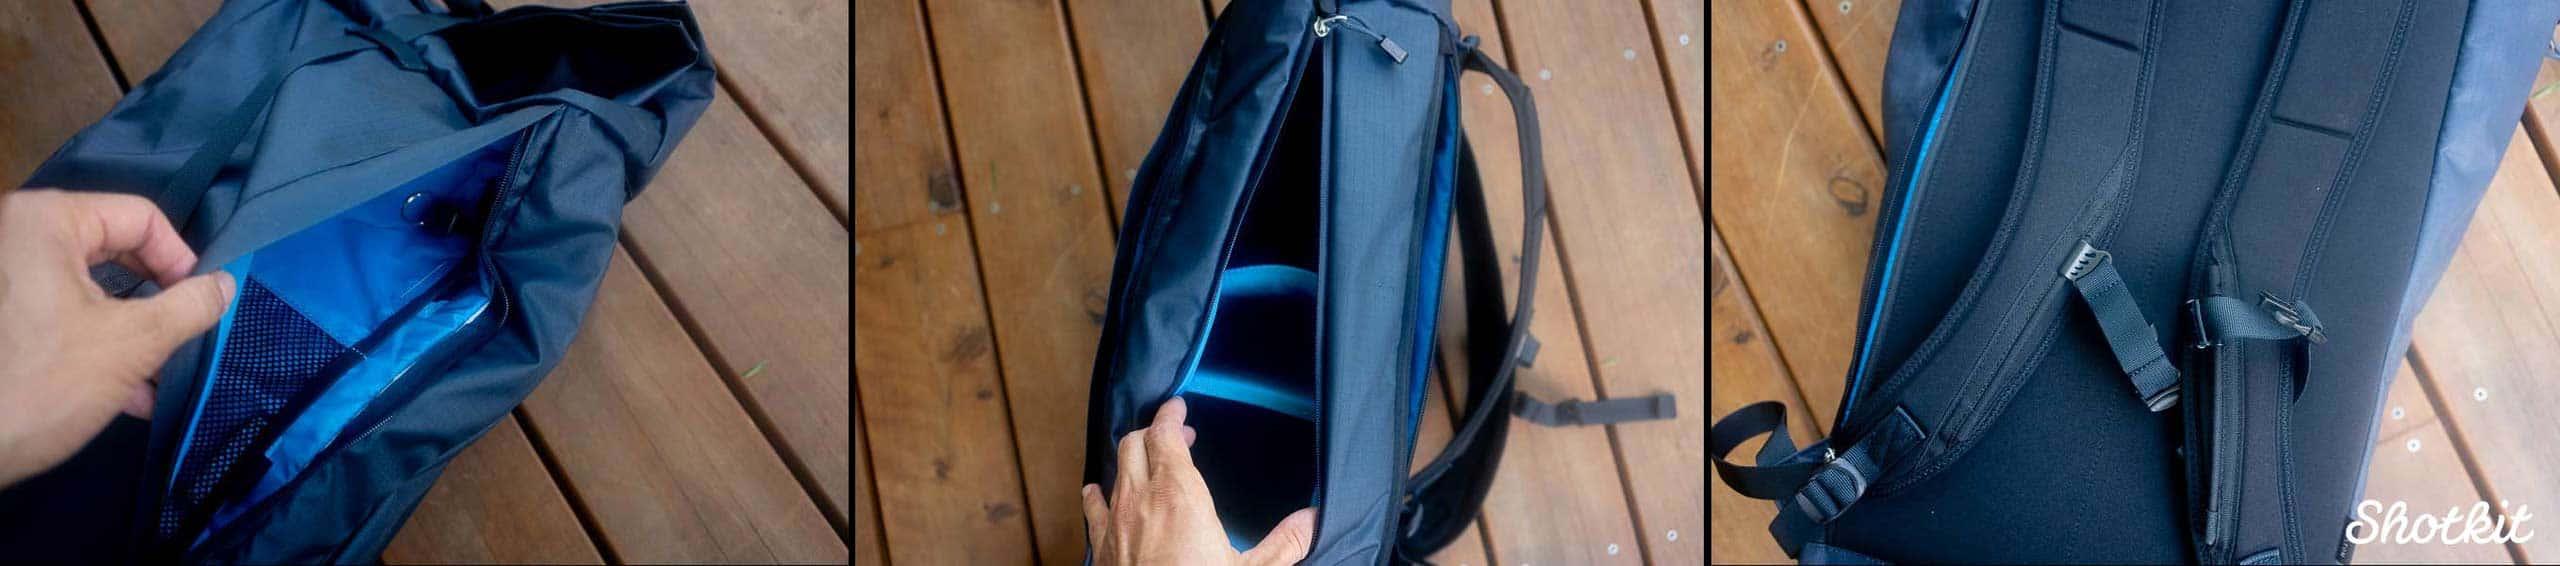 F-stop Dalston camera bag